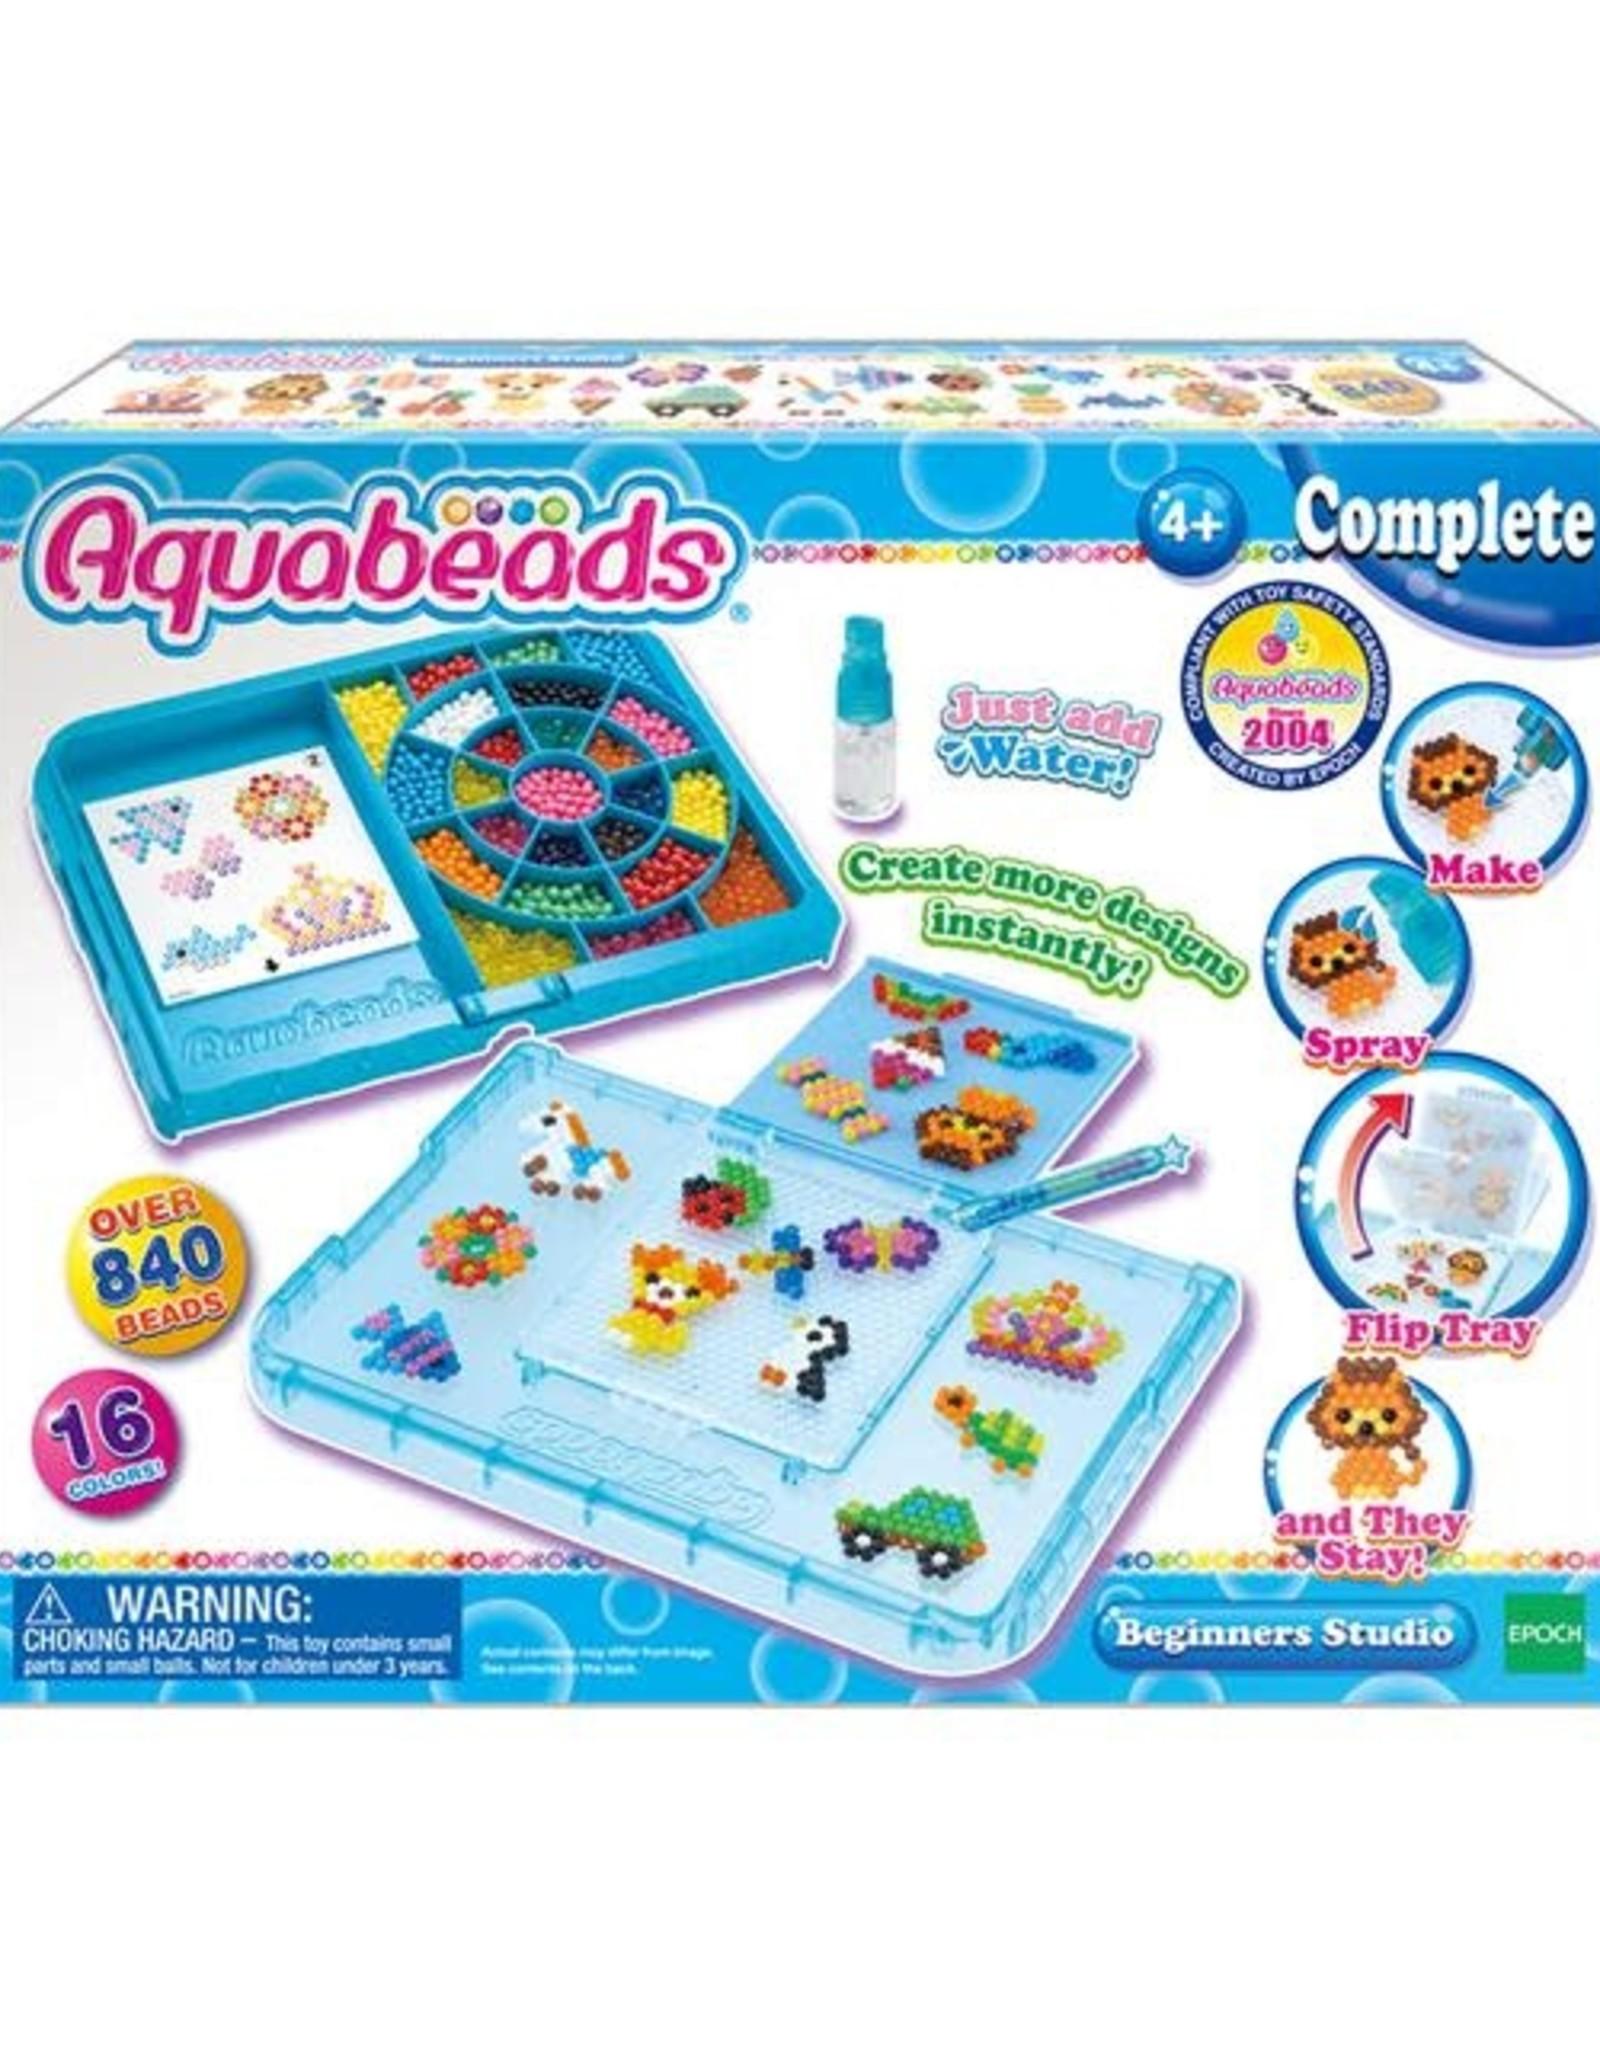 Aquabeads Aquabeads: Beginners Studio